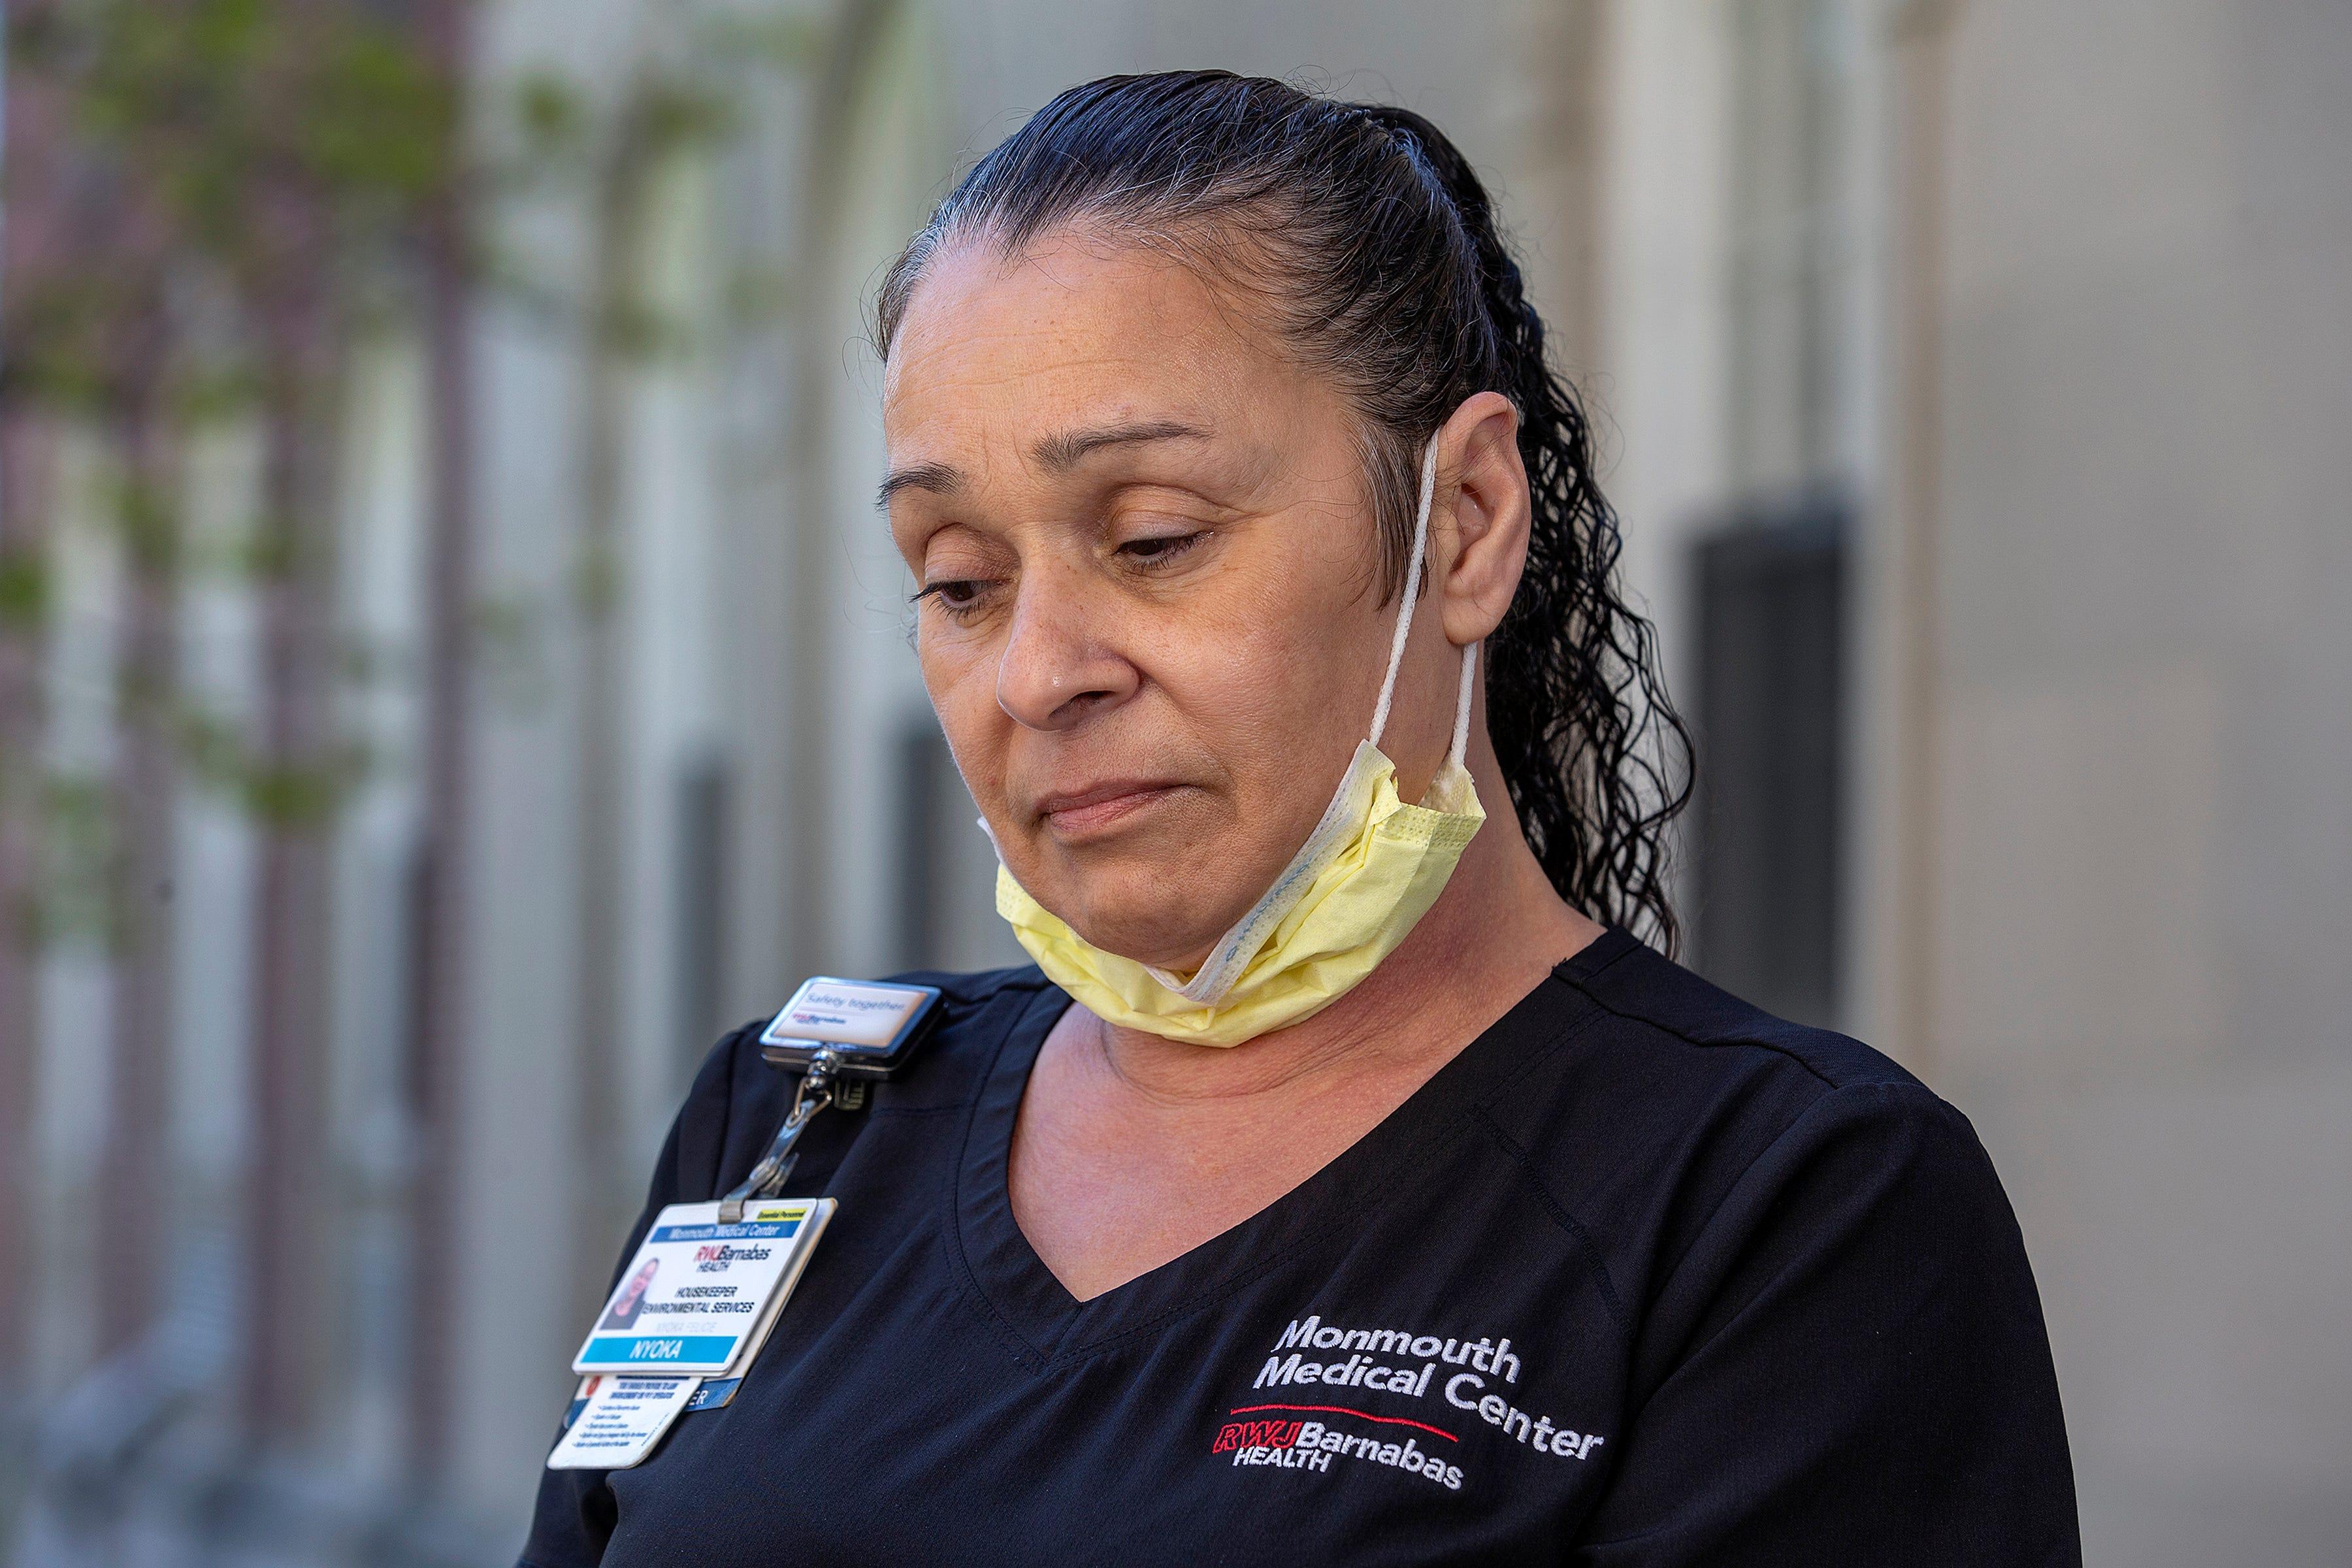 Nyoka Felicie, housekeeper, Monmouth Medical Center